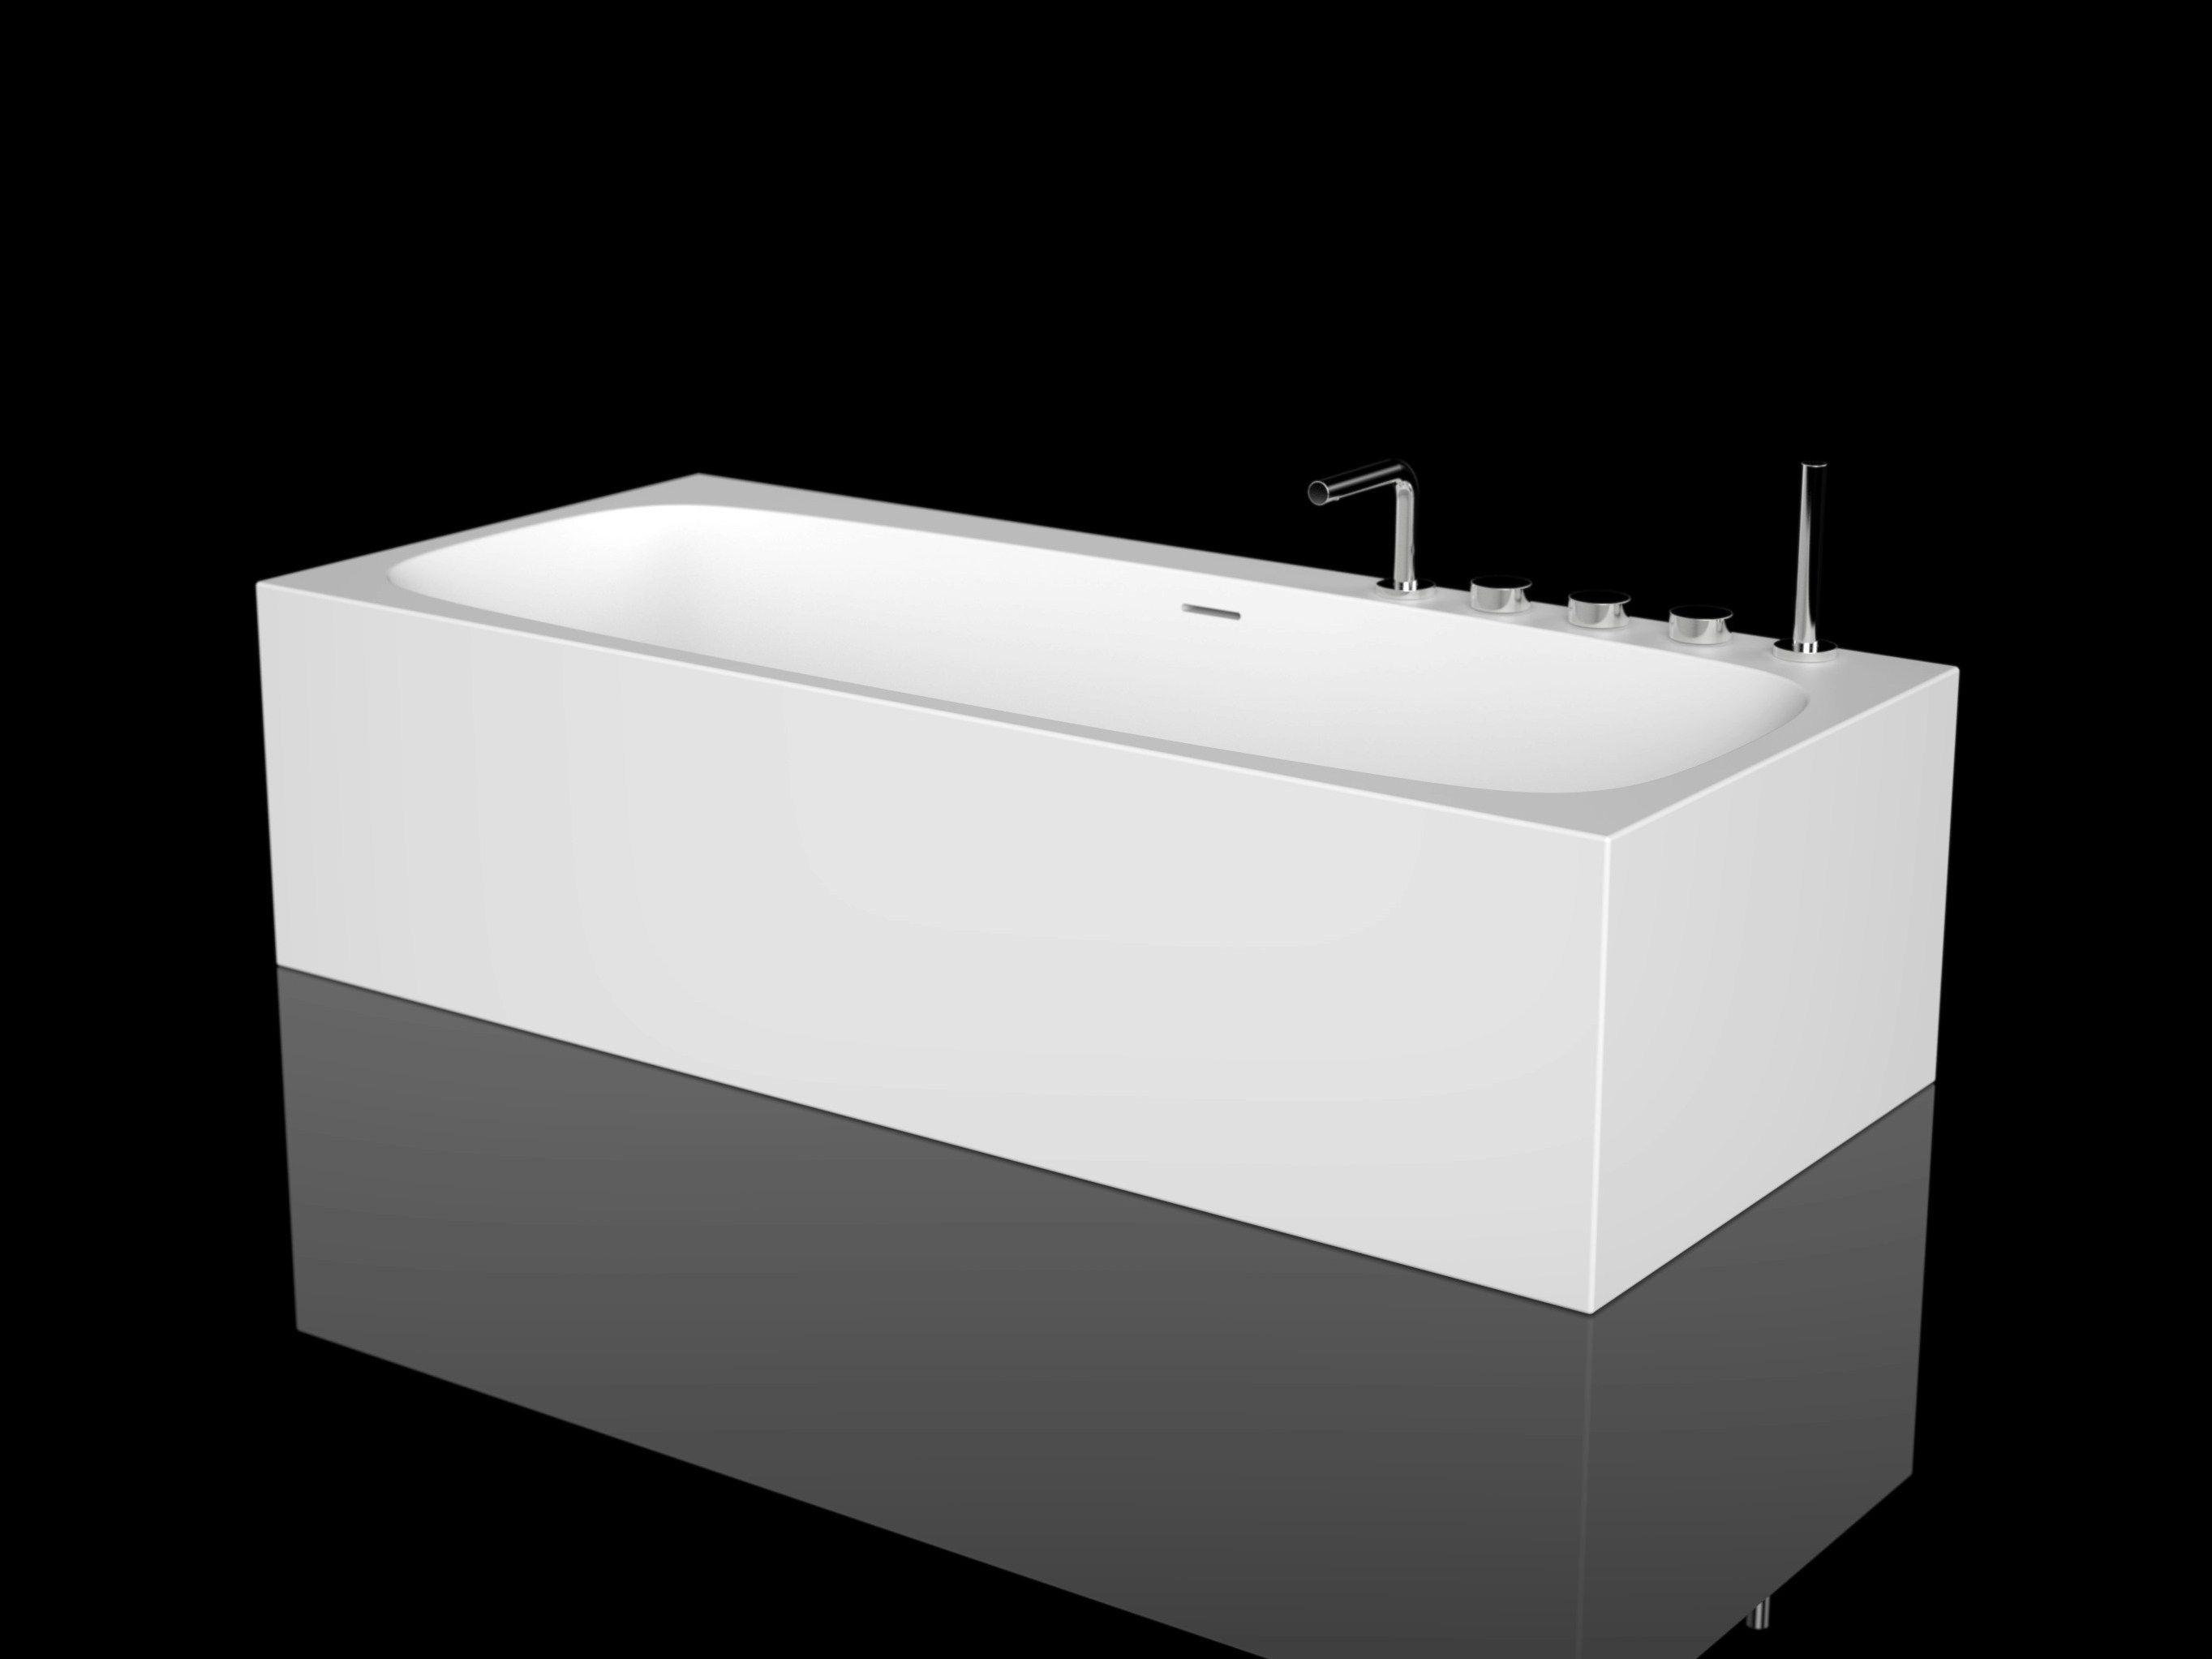 Baignoire rectangulaire en cristalplant ark by boffi - Rivestire la vasca da bagno ...